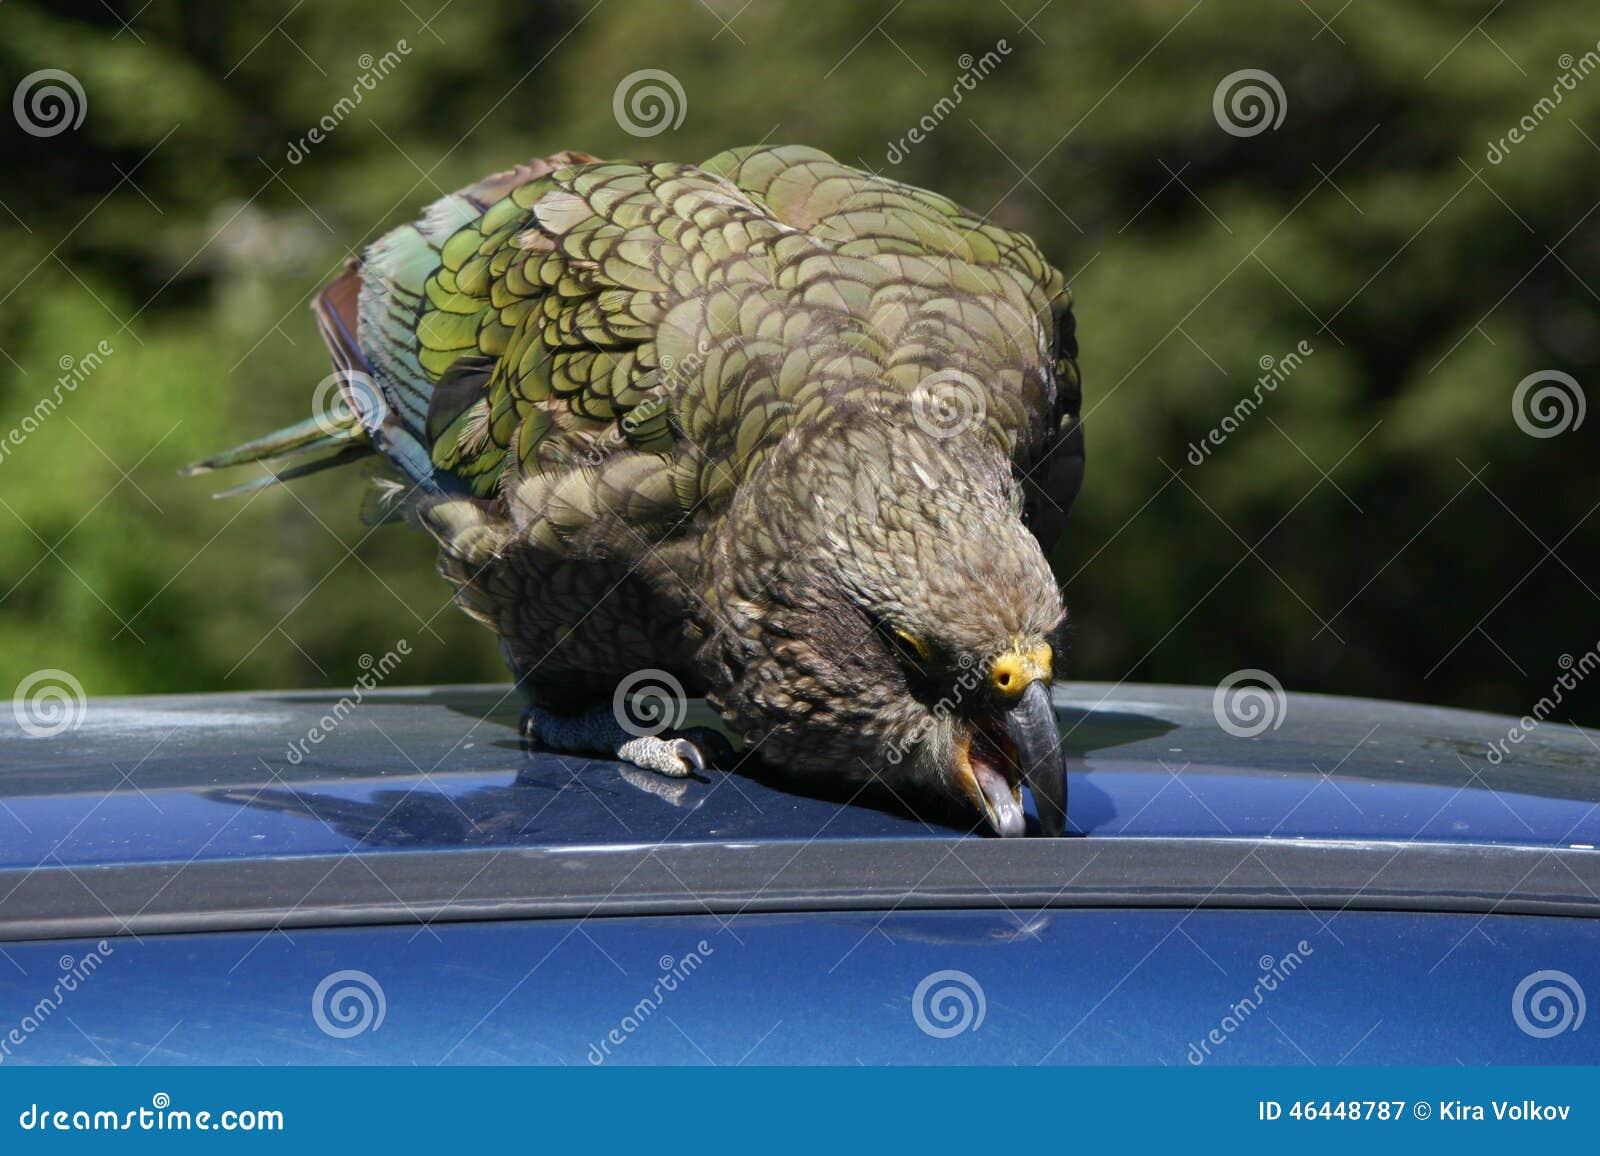 new zealand native bird kea parrot trying to get into a victor birdsong charles city facebook victor bird usa judo 2018